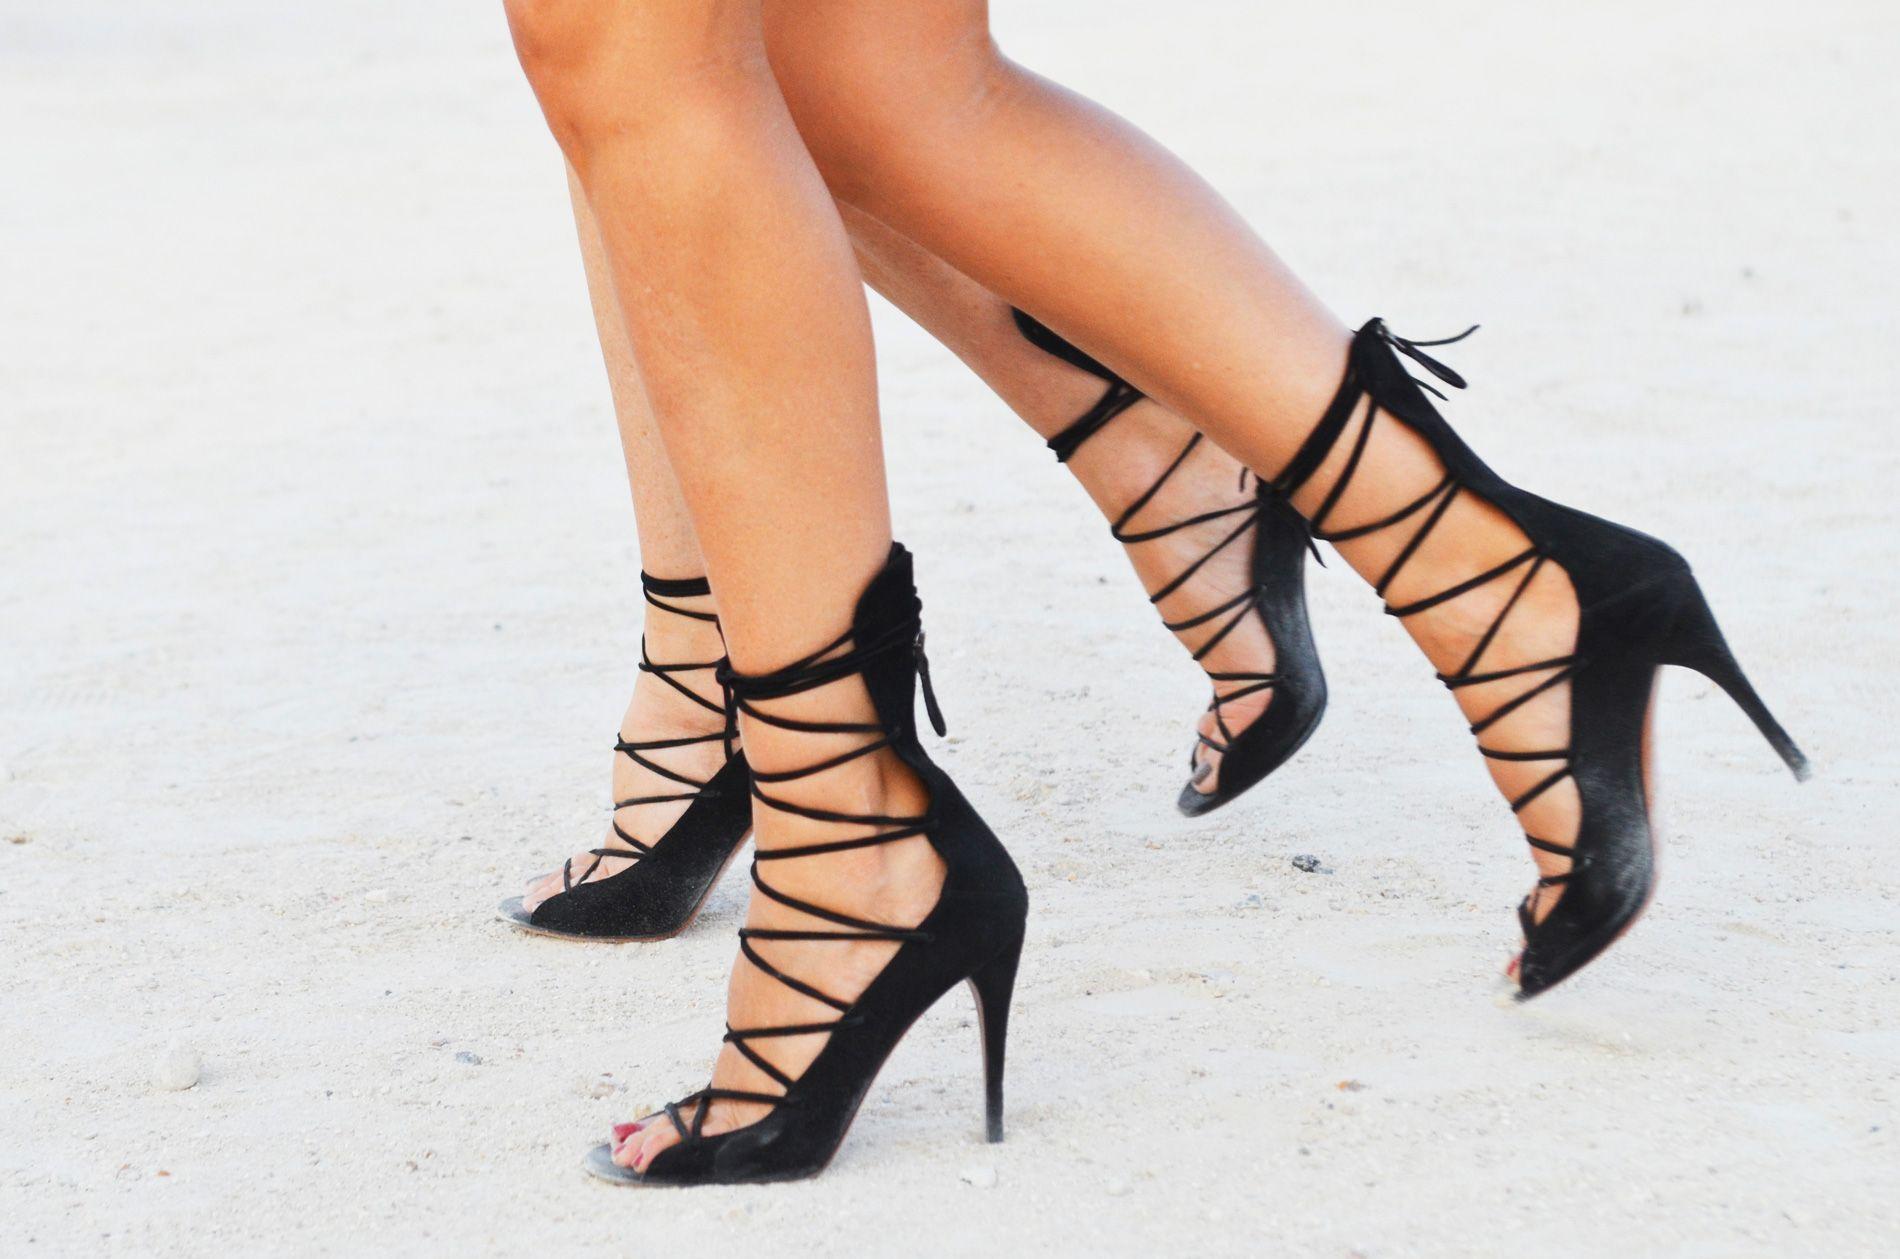 ede2d9d1e67 The shoes I should have bought Diy Lace Up Heels